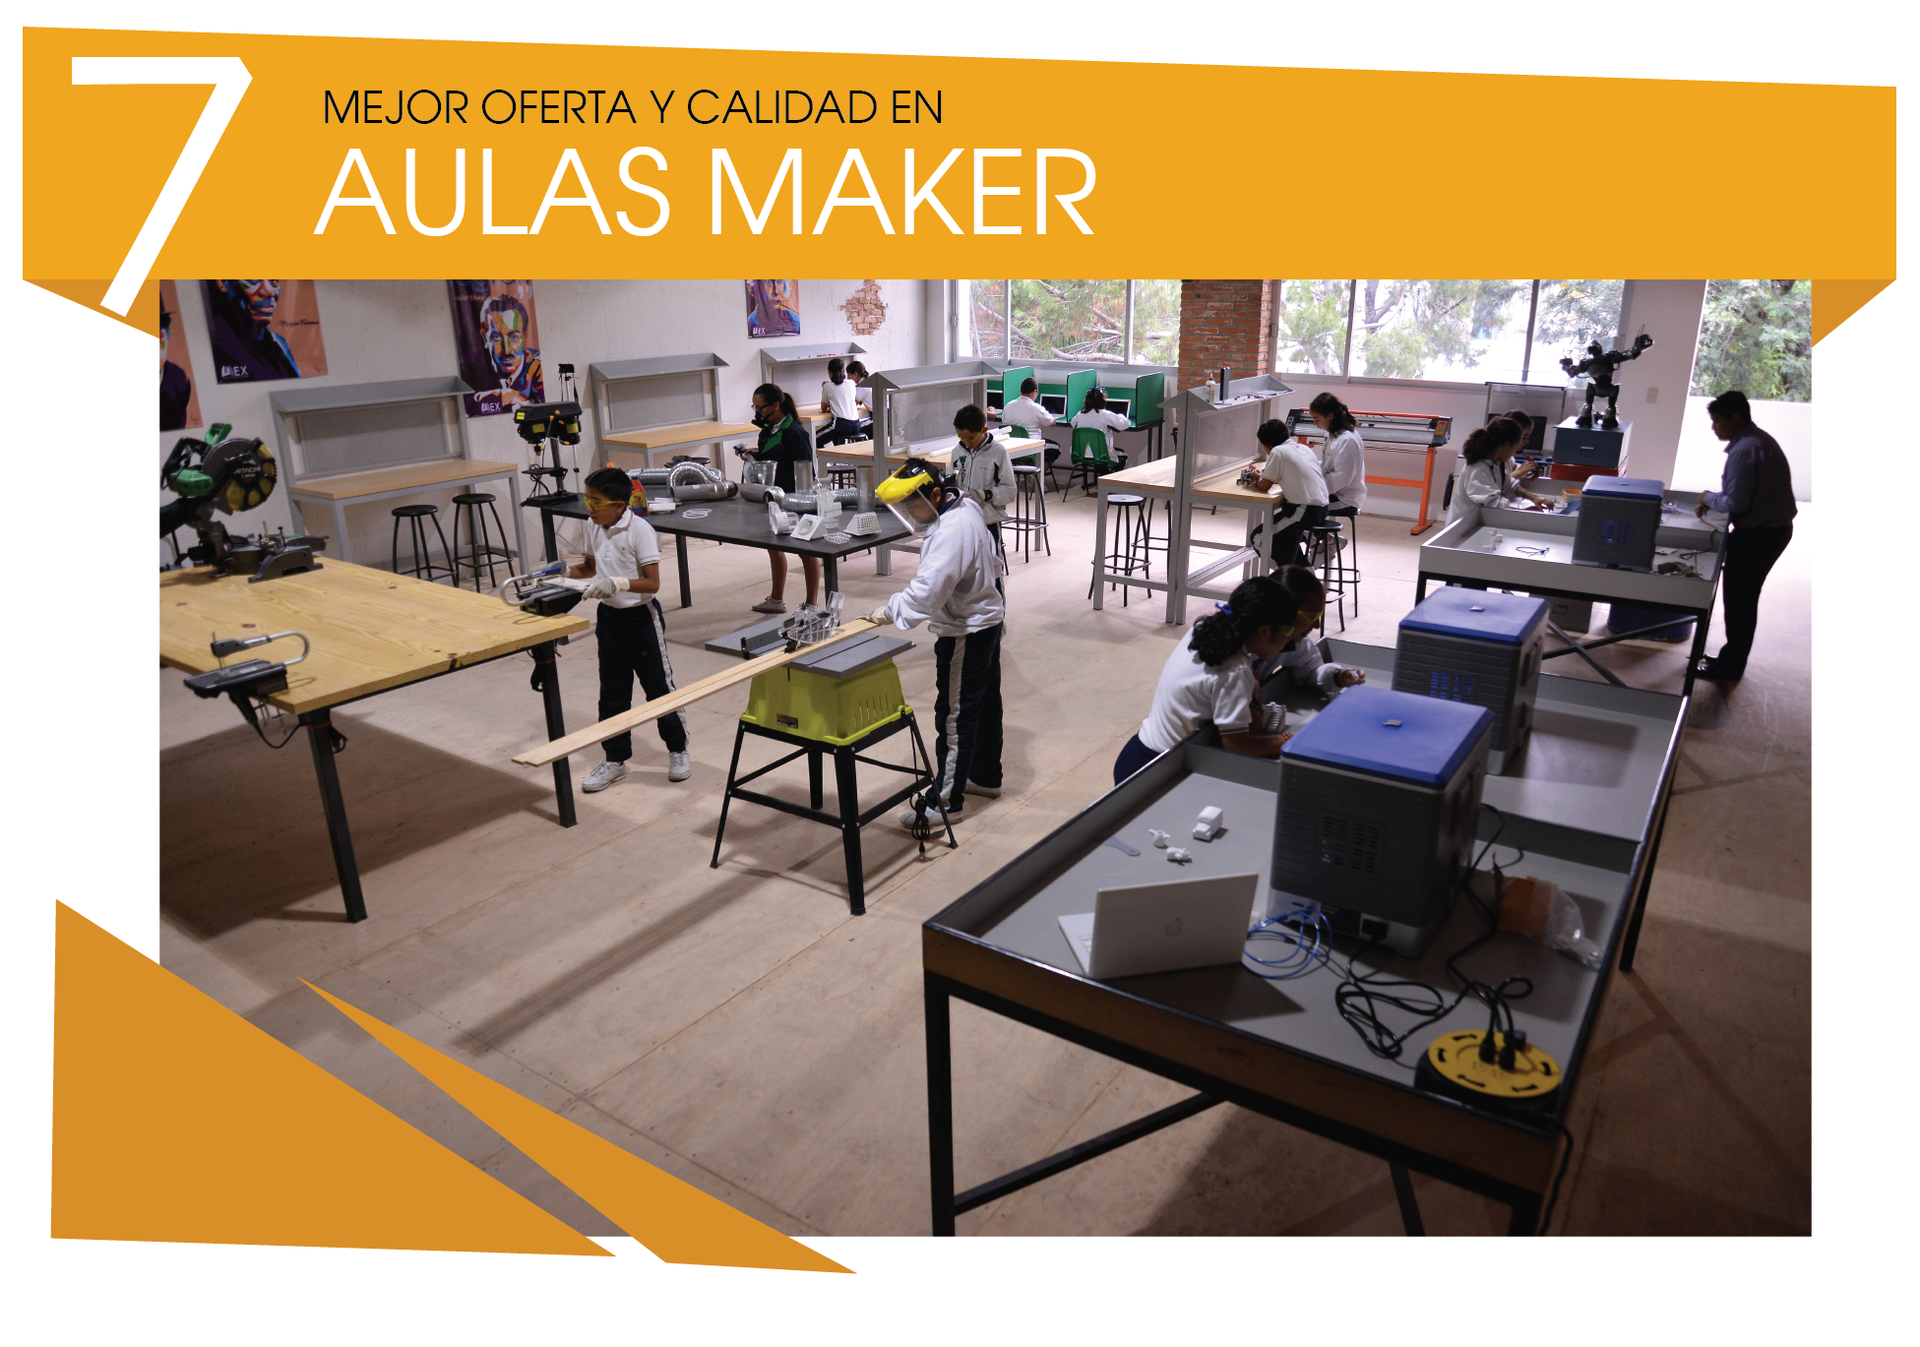 aulas maker